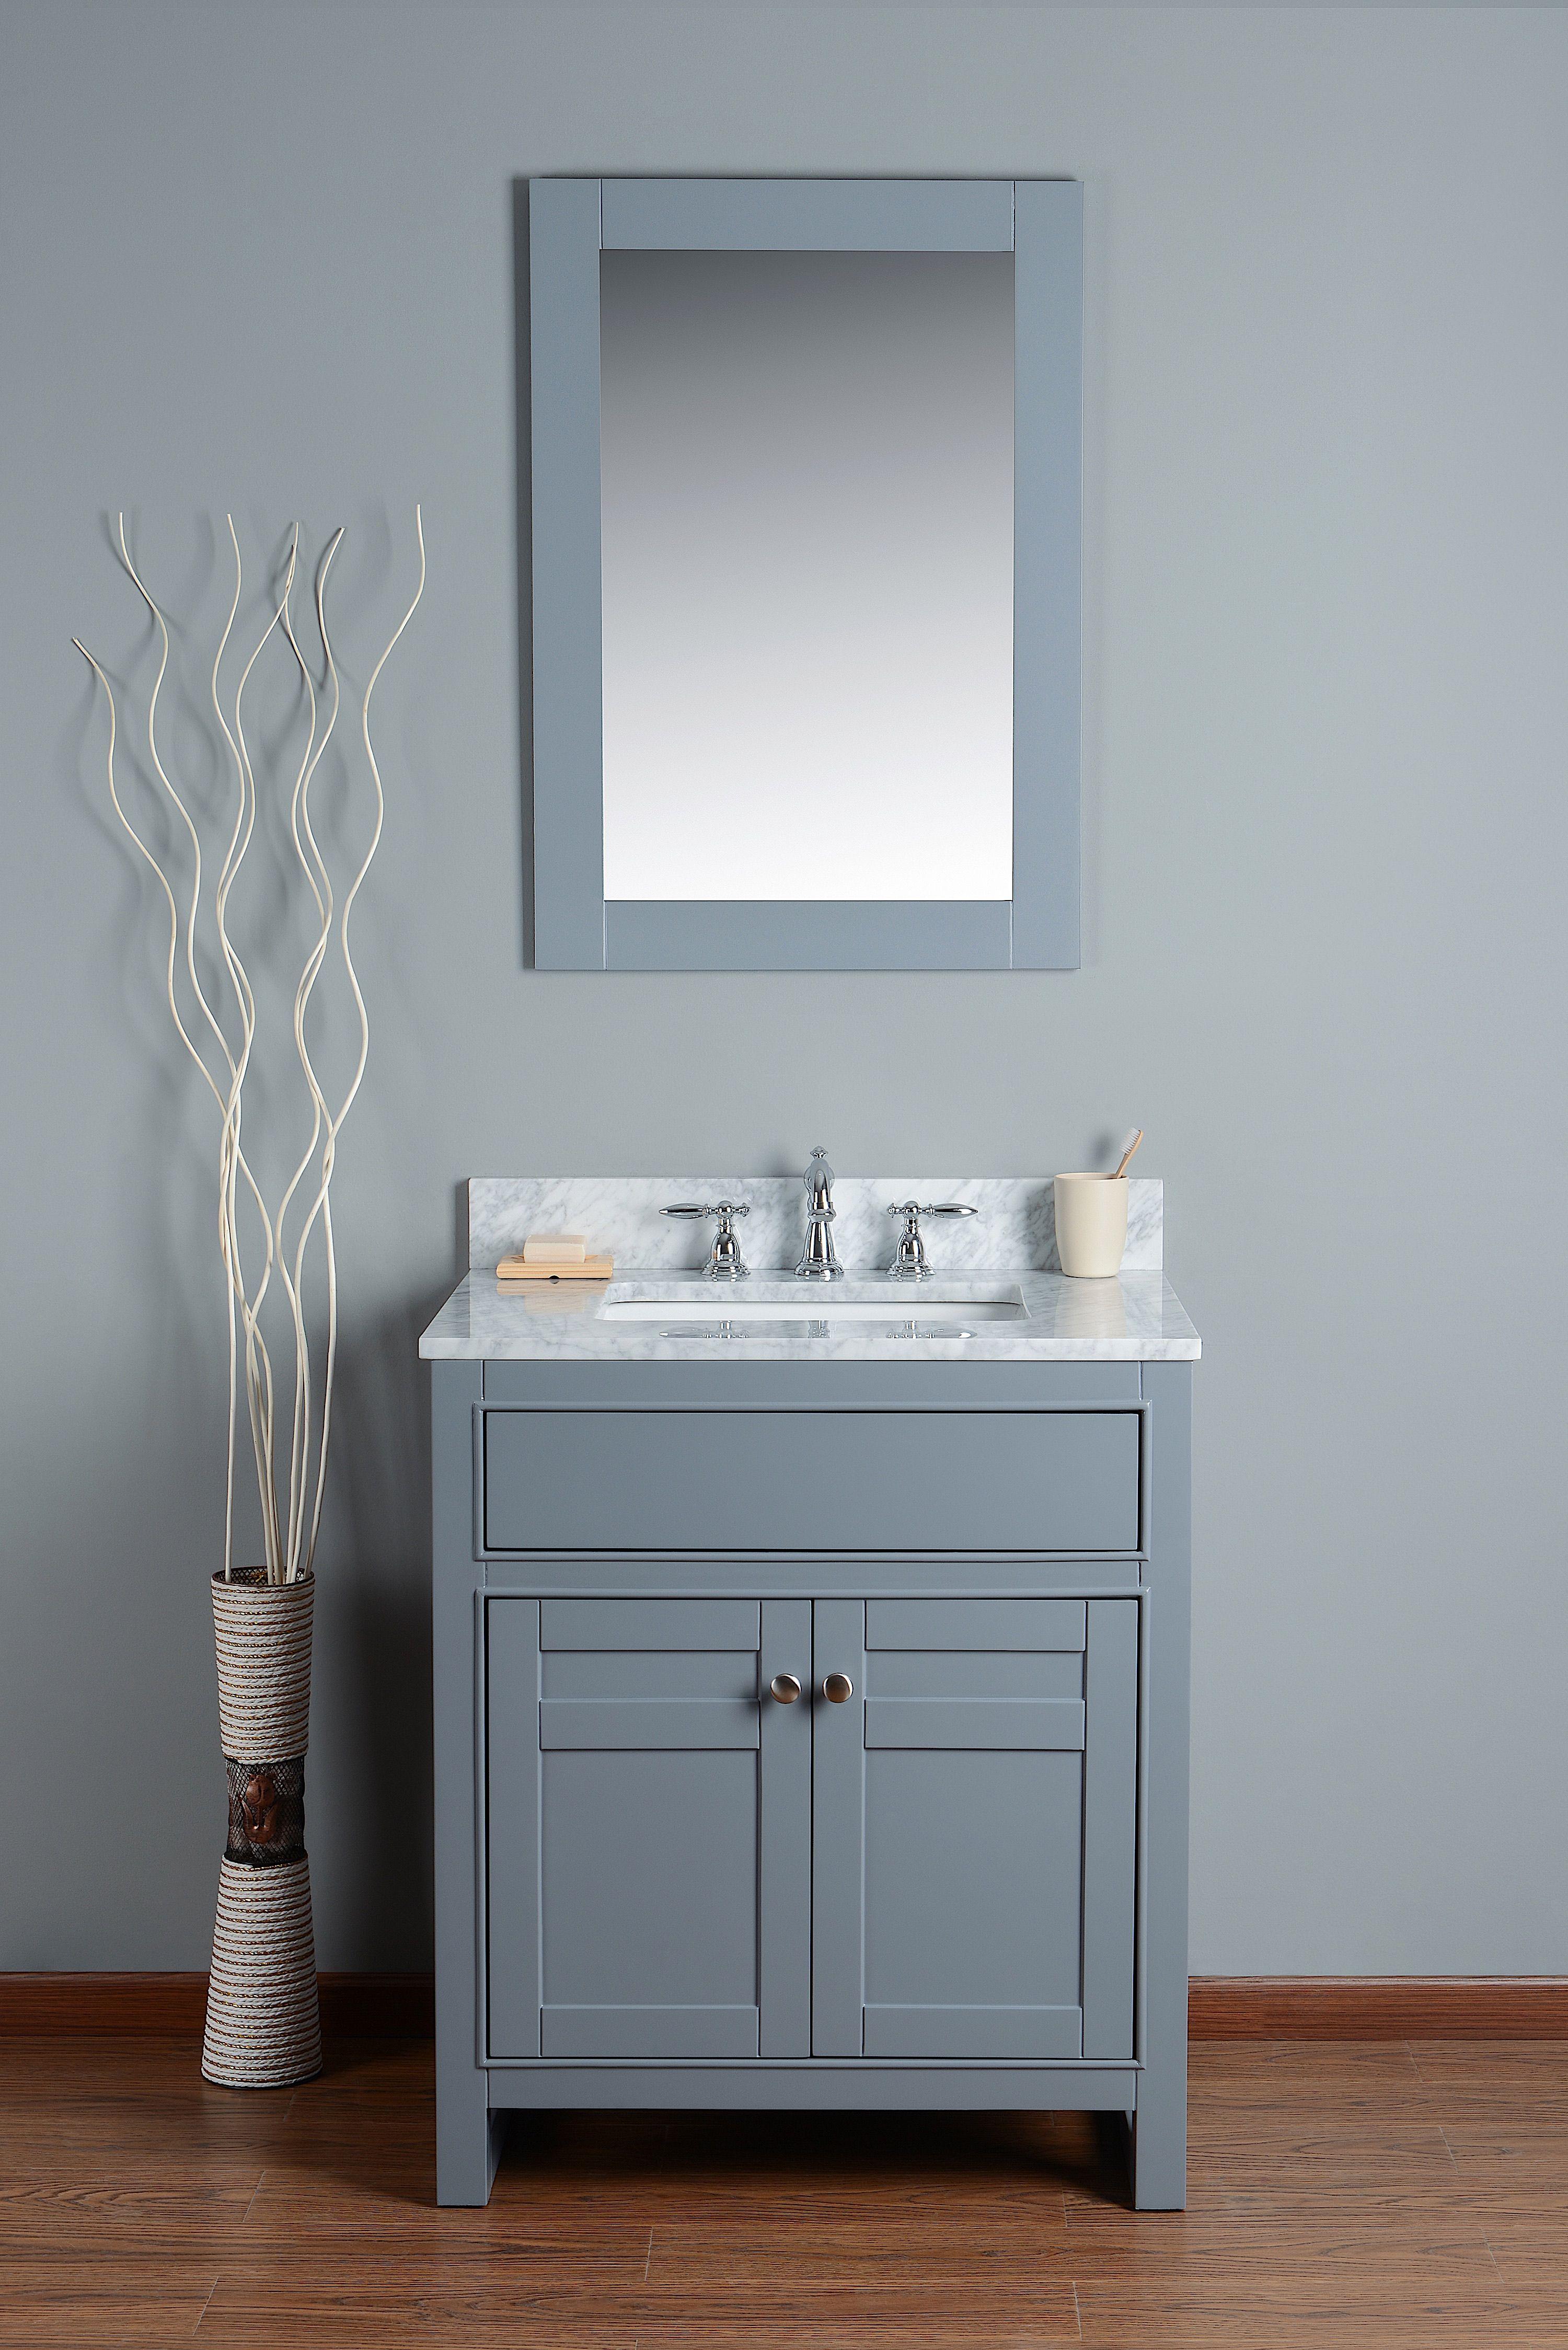 Pin by Kitchen Cabinet Kings on Bathroom Vanities | Pinterest ...